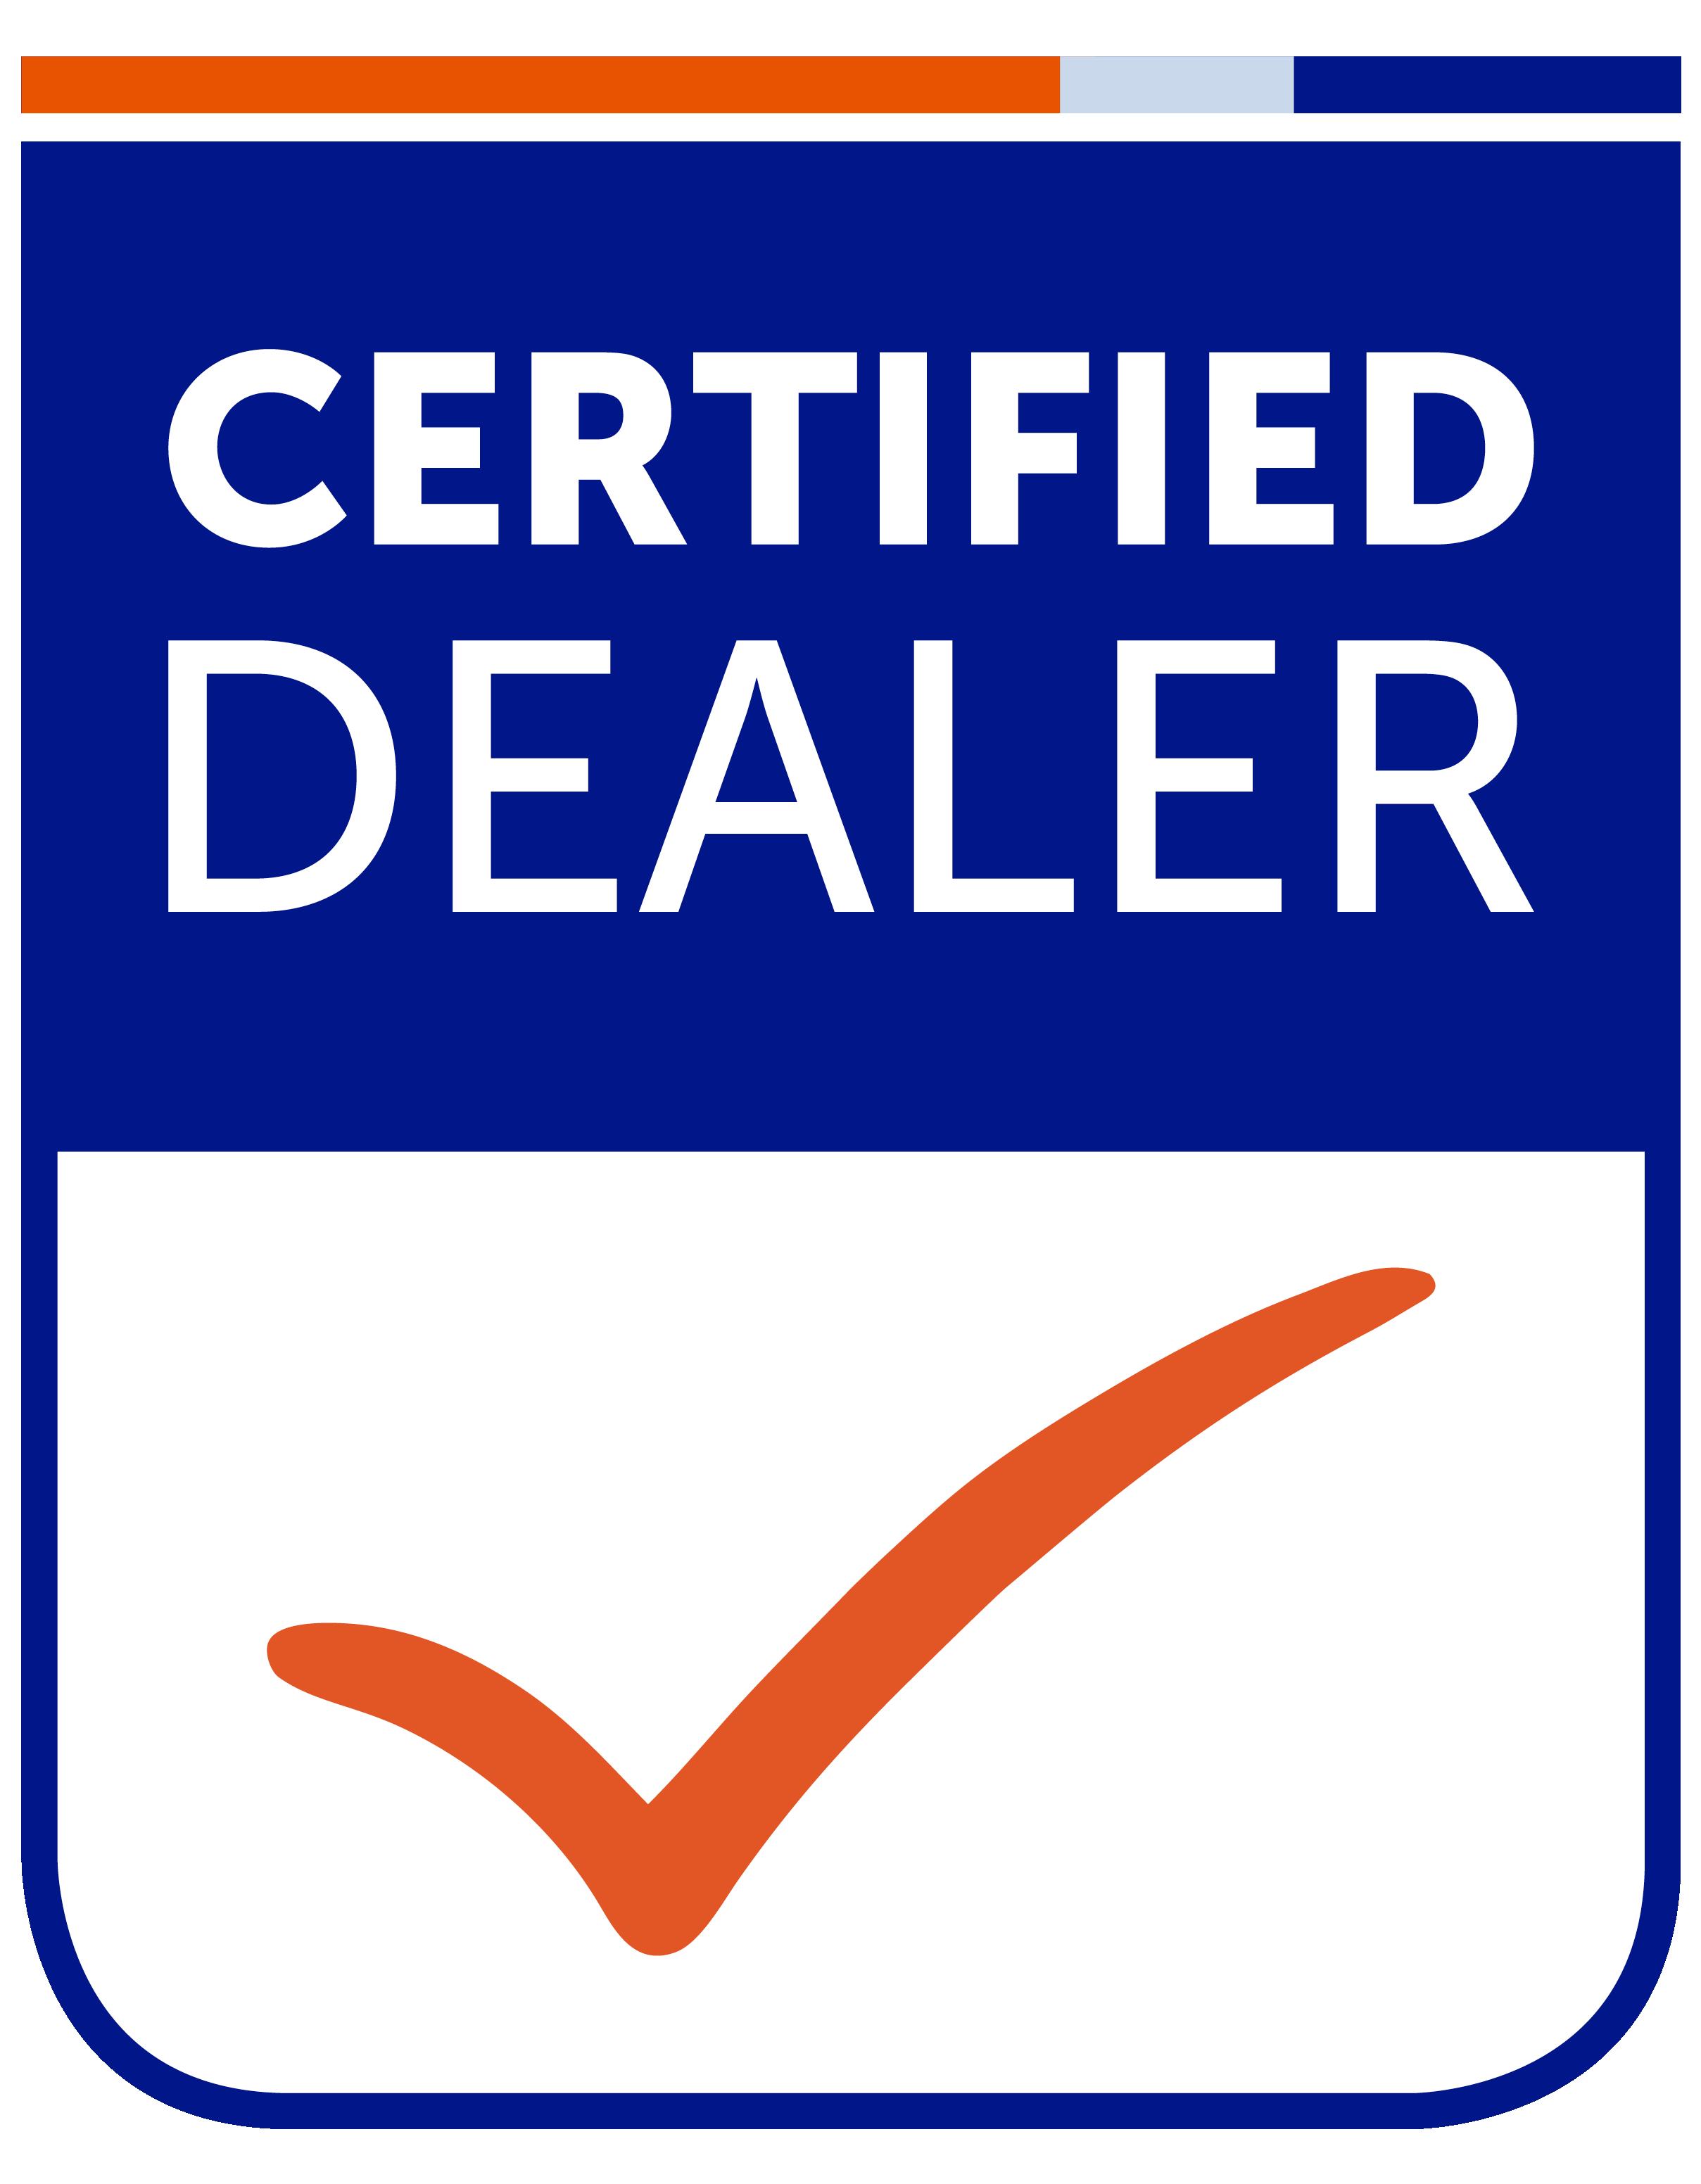 work safety nearest chrysler pick dealer top rating earns vehicles ratingfca tspp blog iihs